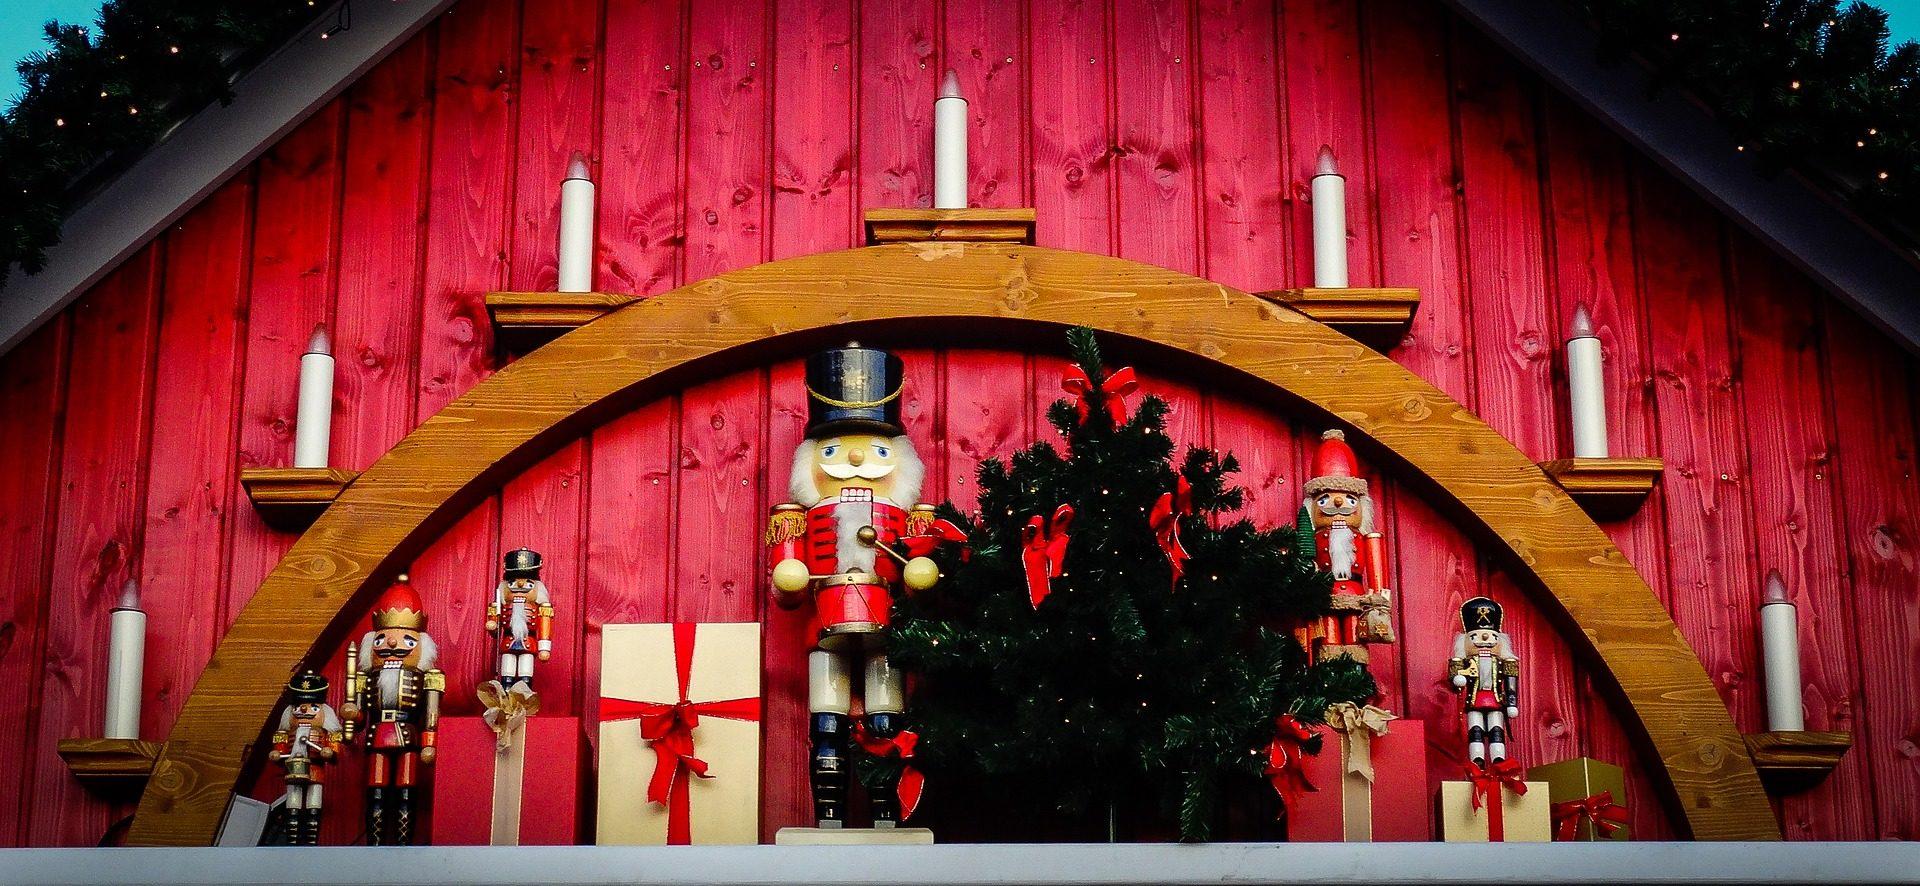 ornamenti, Schiaccianoci, soldati, árbol, candele, Natale - Sfondi HD - Professor-falken.com